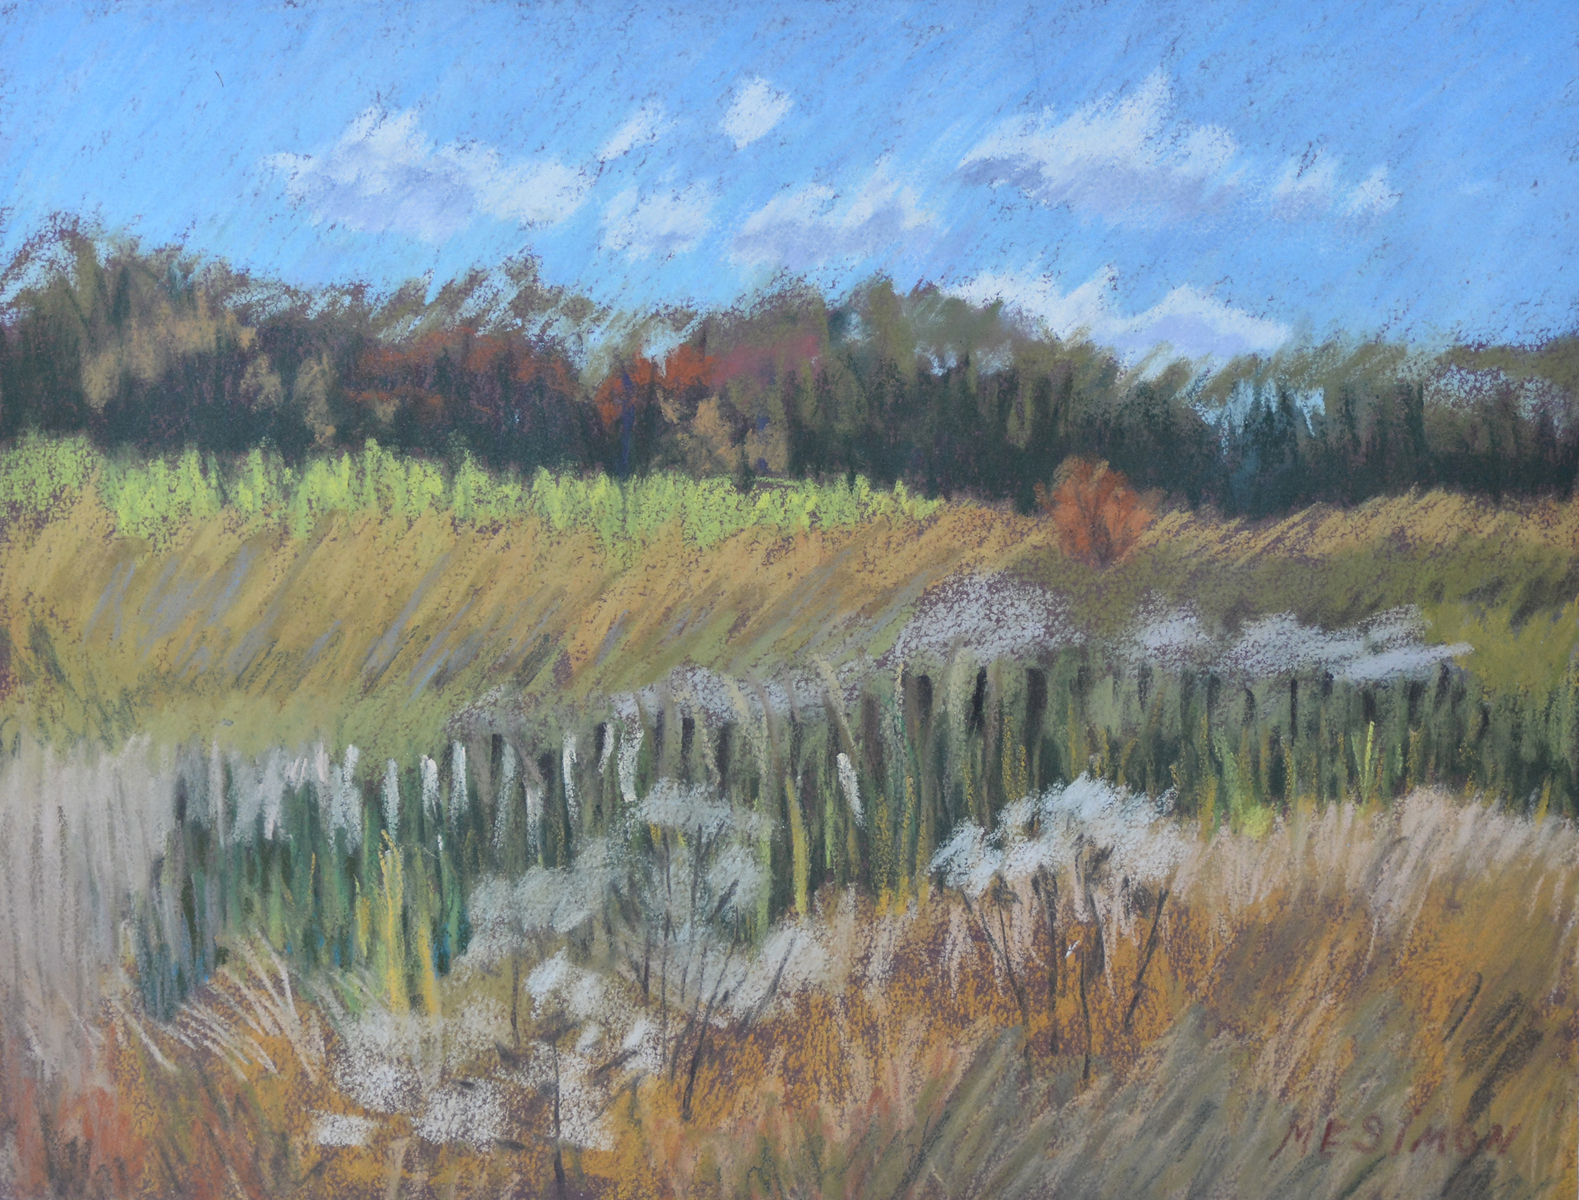 M.E. Simon, Autumn Wetlands